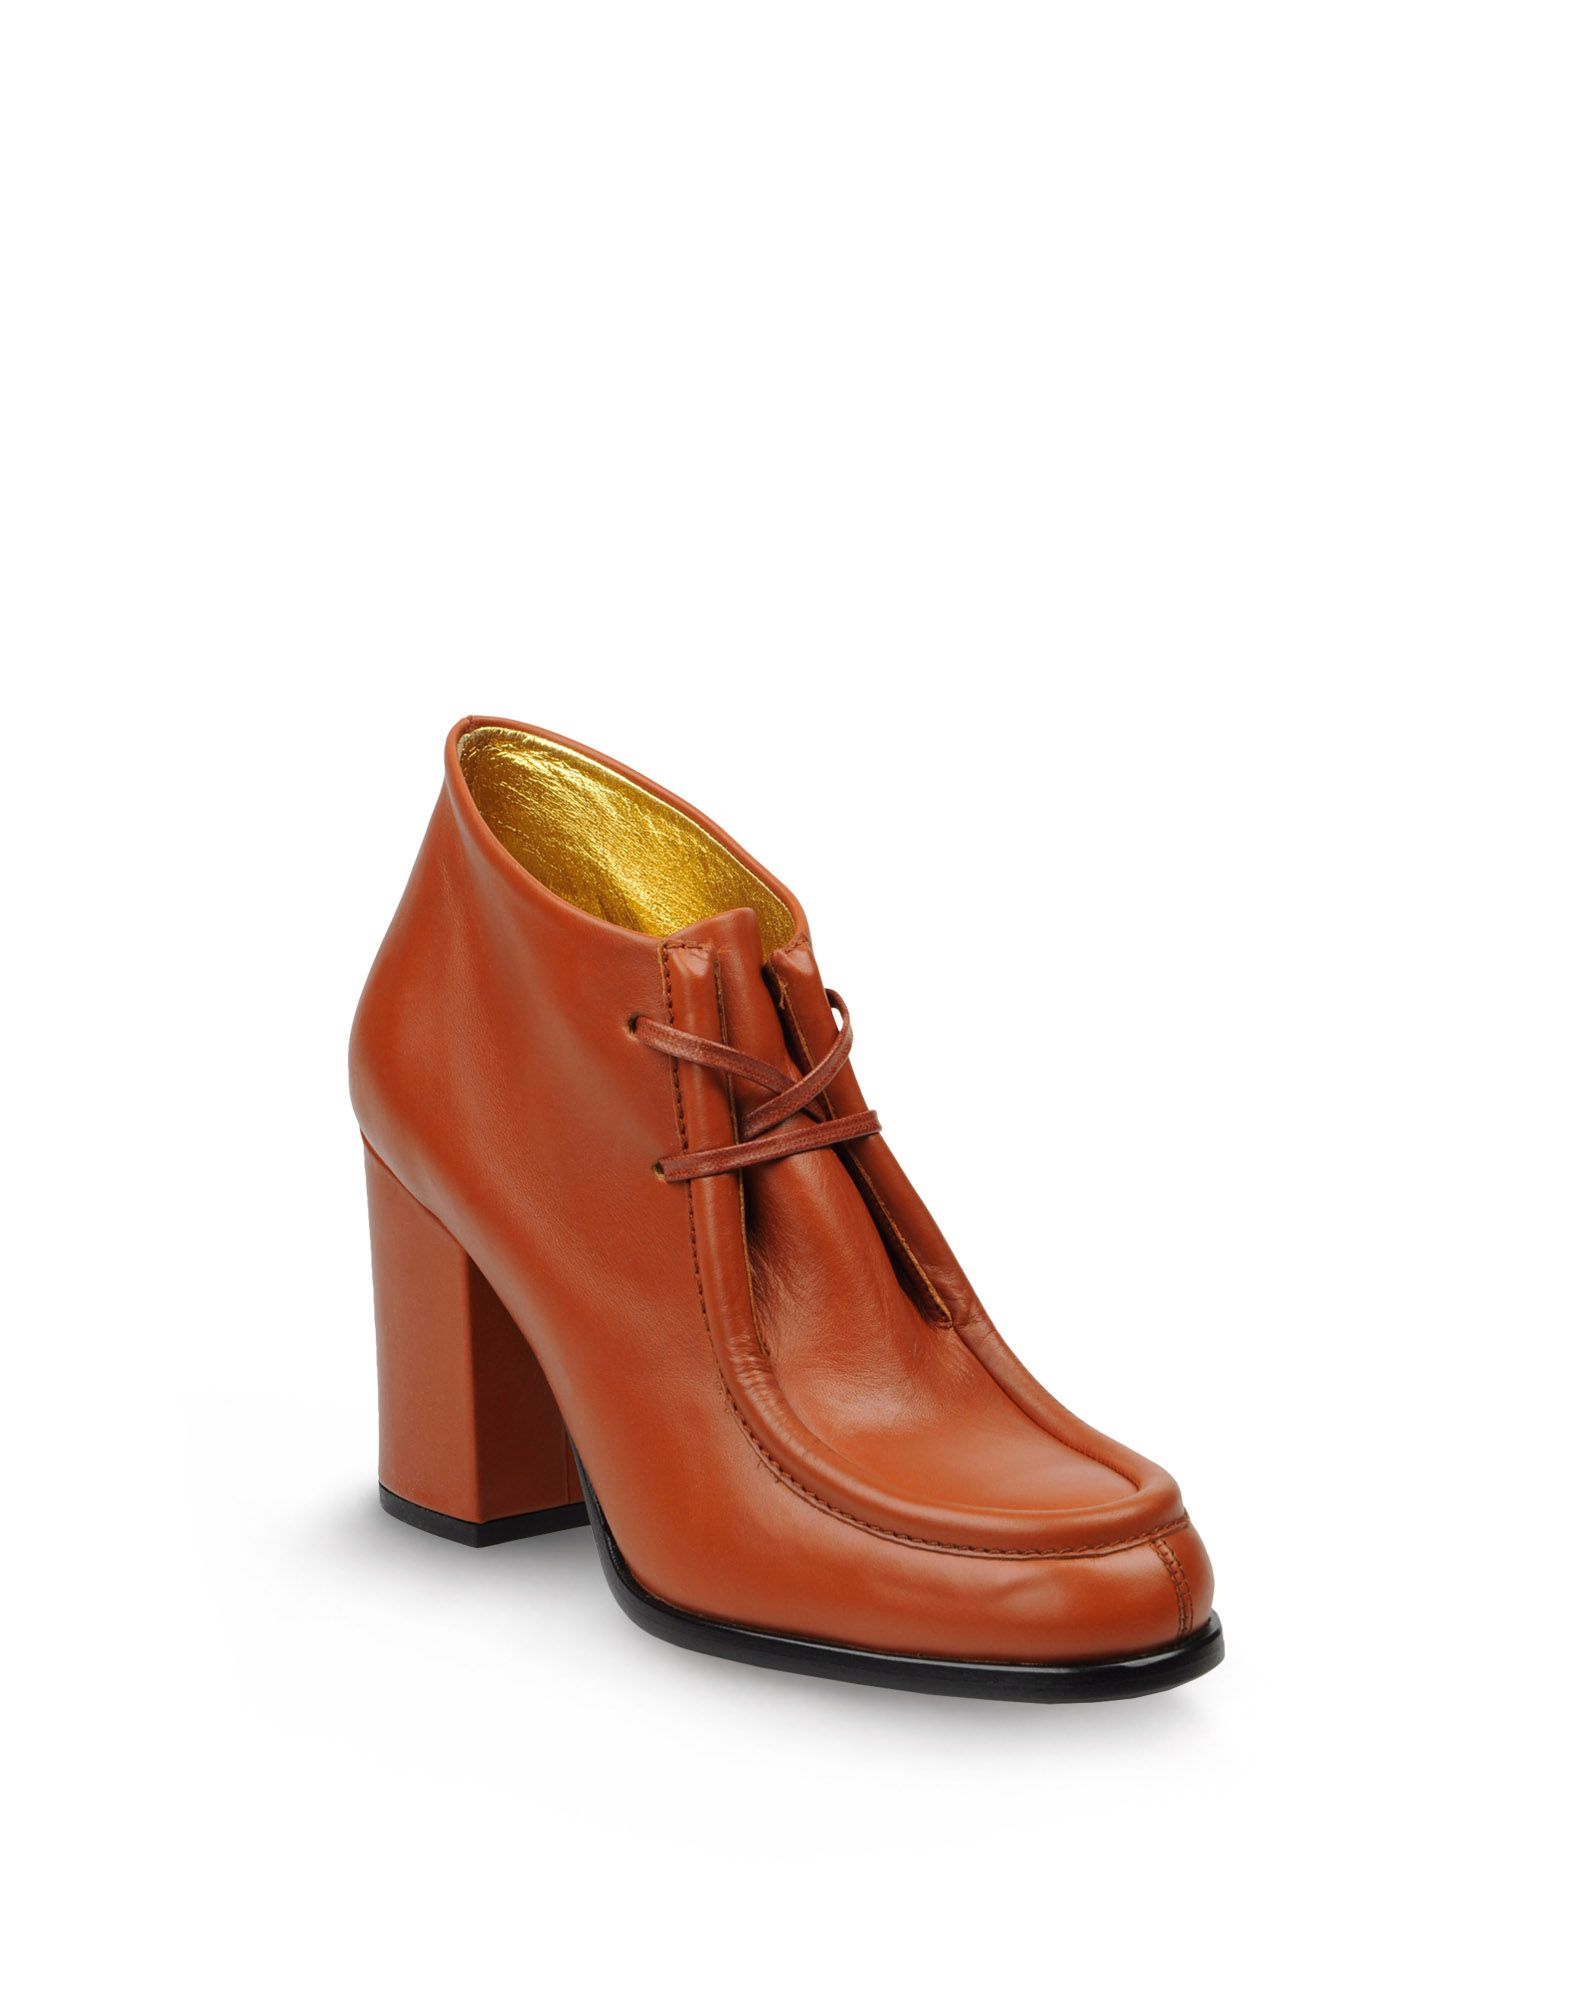 Ankle boots - JIL SANDER NAVY Online Store